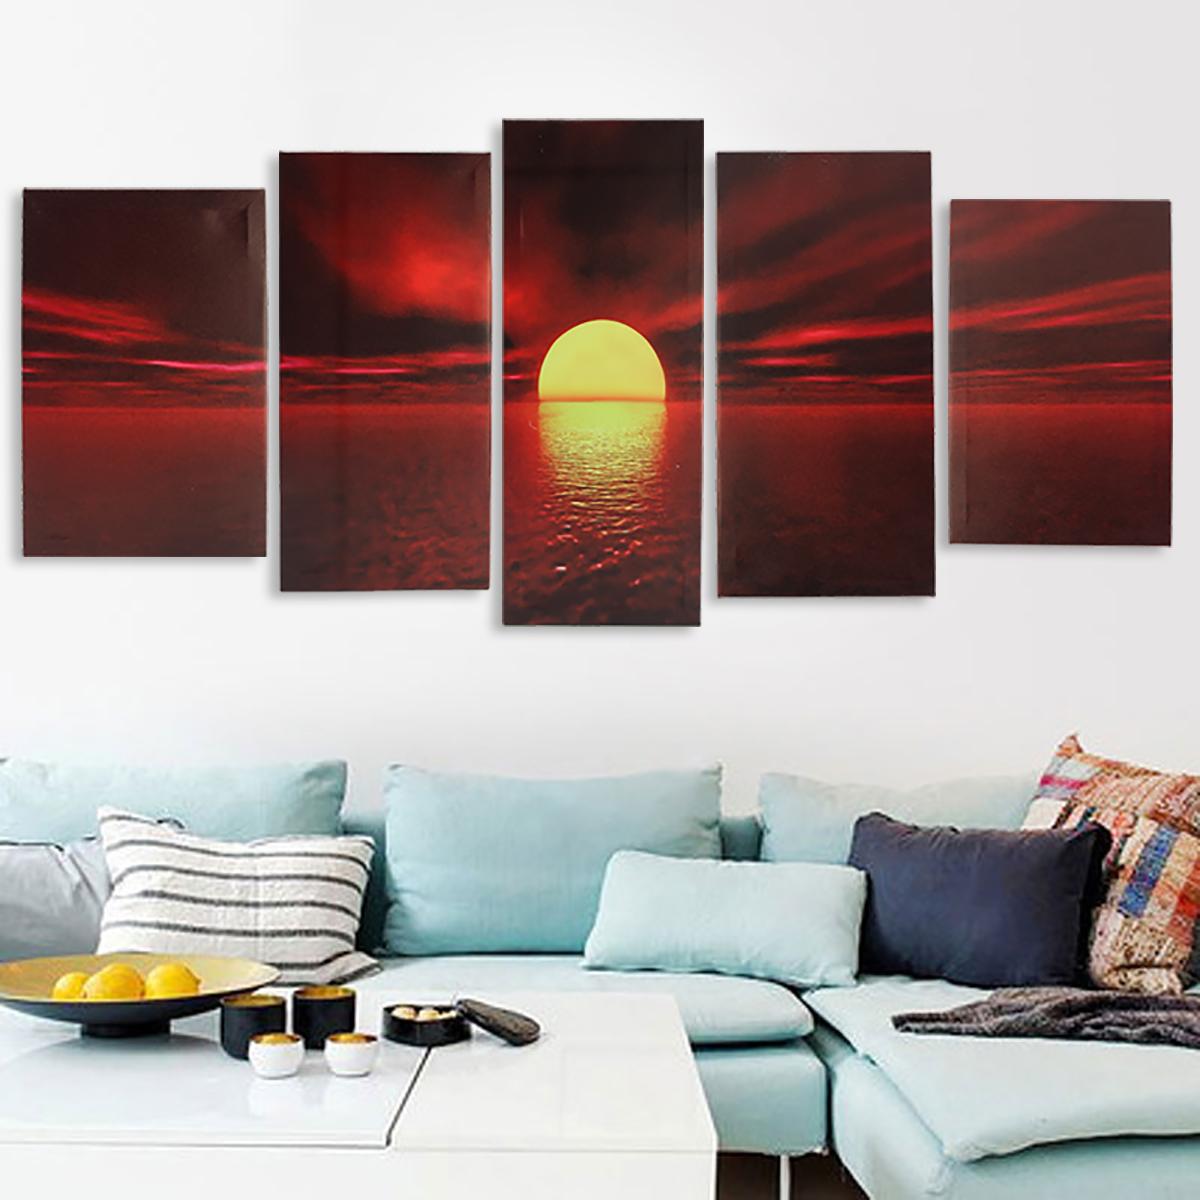 Asewin Sunrise Red Sun Modern 5 Piece Framed Wrapped Landscape